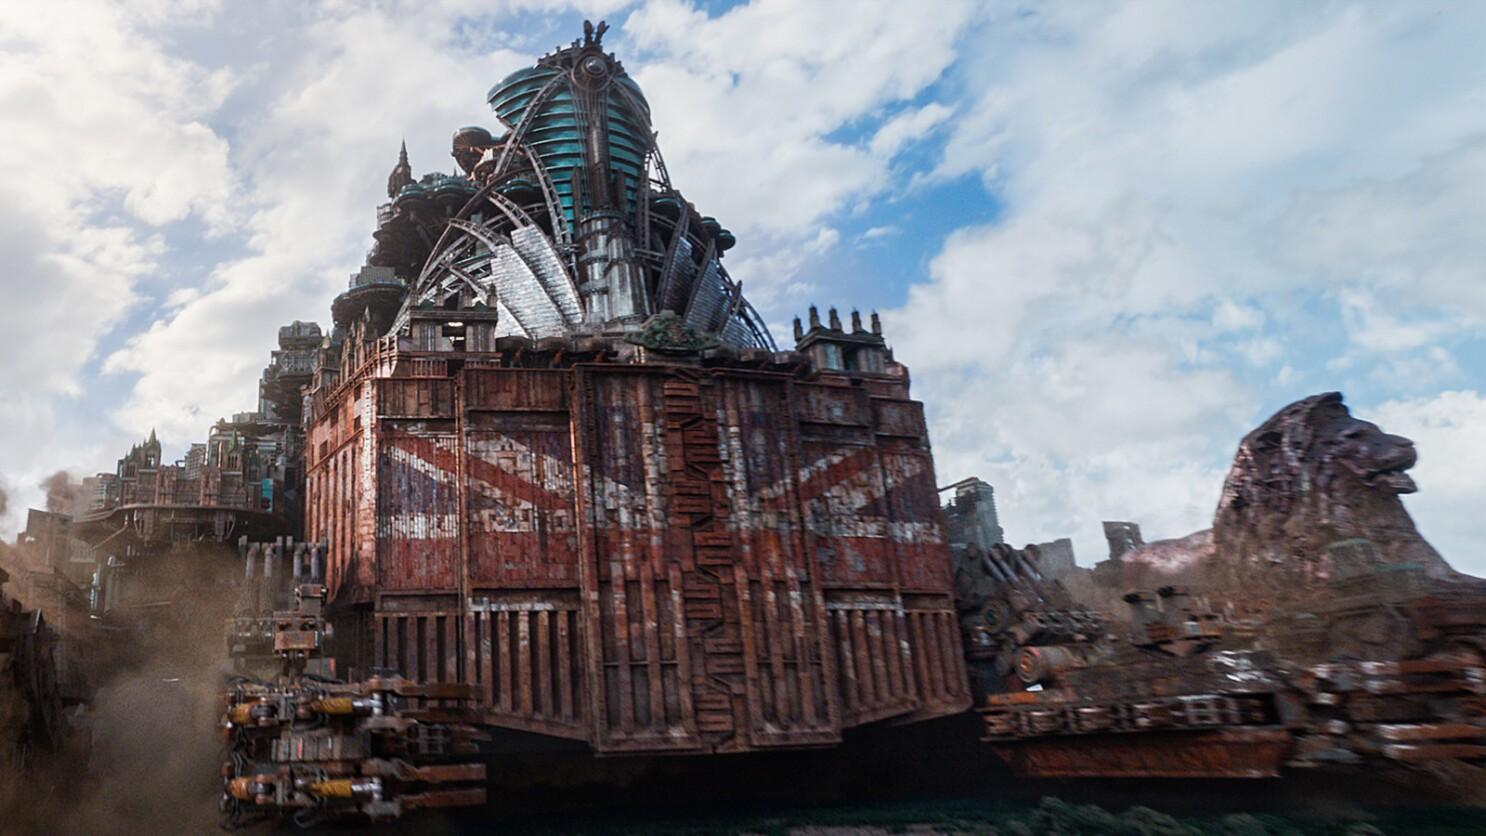 Review: 'Mortal Engines,' a visual marvel, is half wonderful, half monotonous - Los Angeles Times